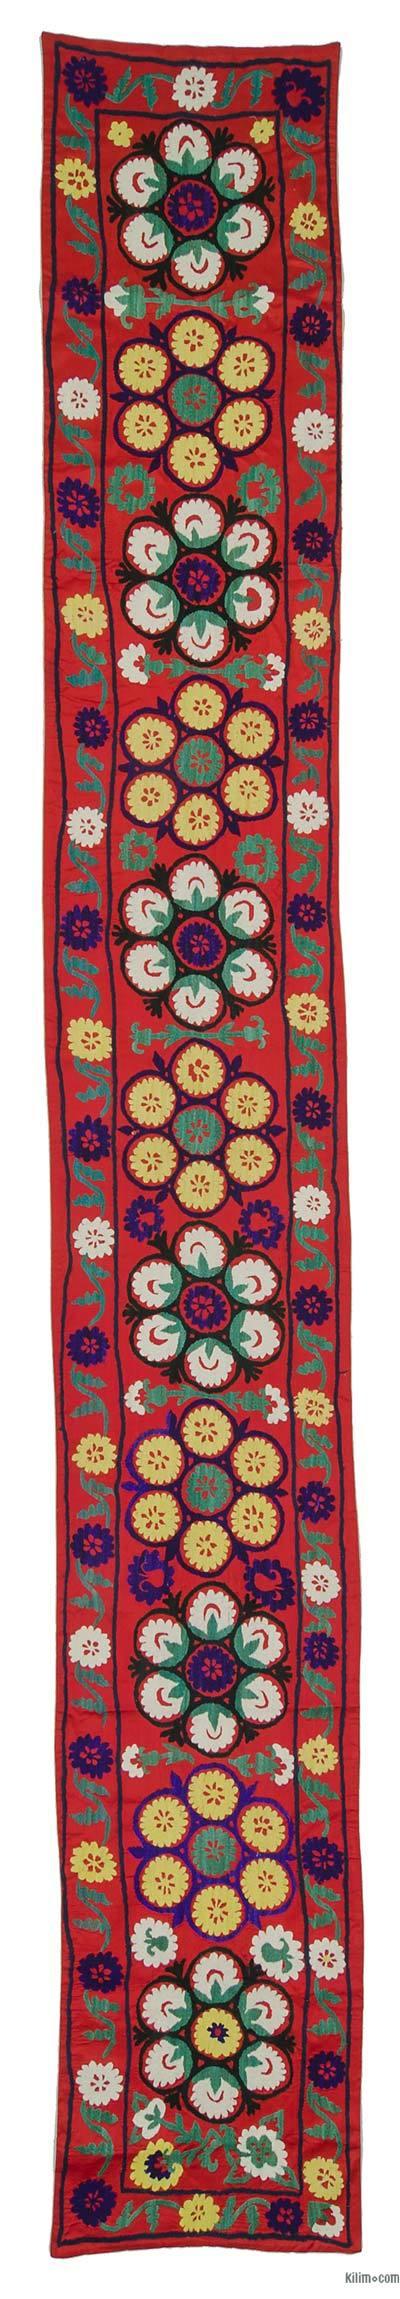 Özbek Kilimi - 58 cm x 416 cm